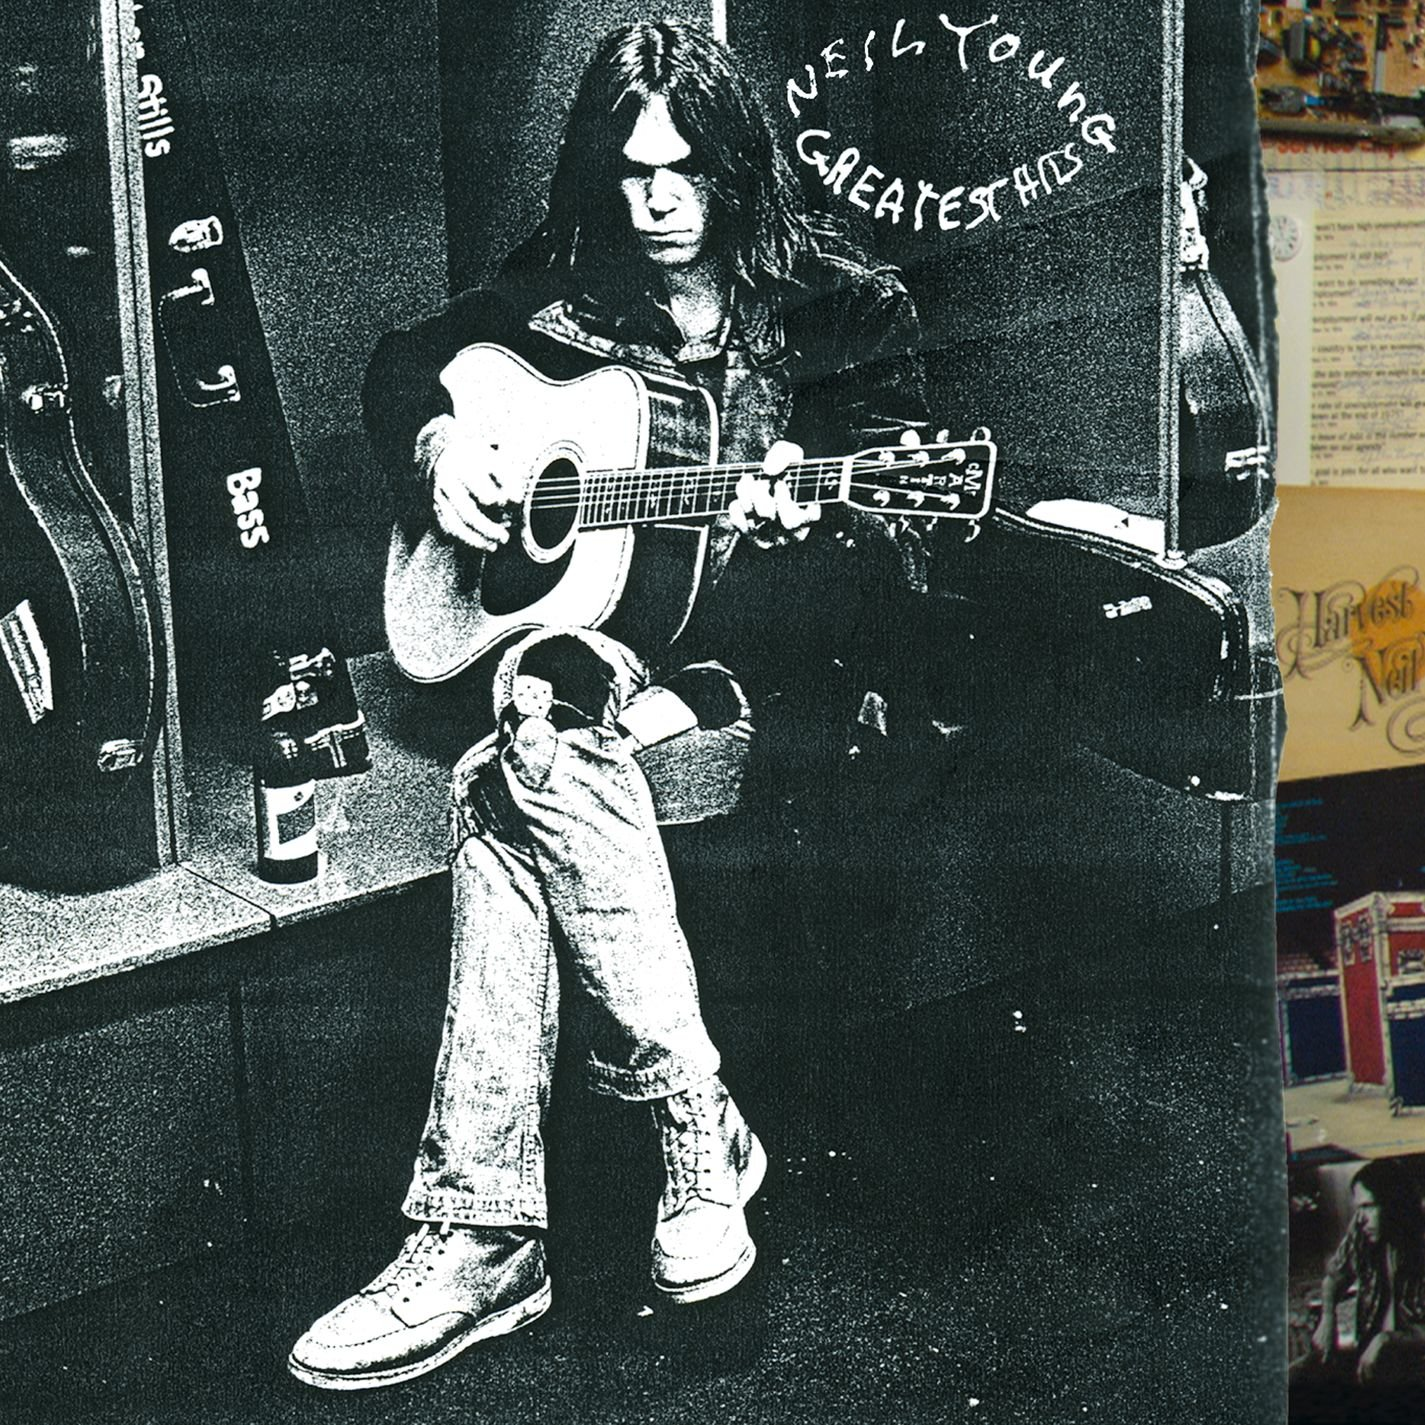 Greatest Hits (2LP 180 Gram Vinyl w/Bonus 7